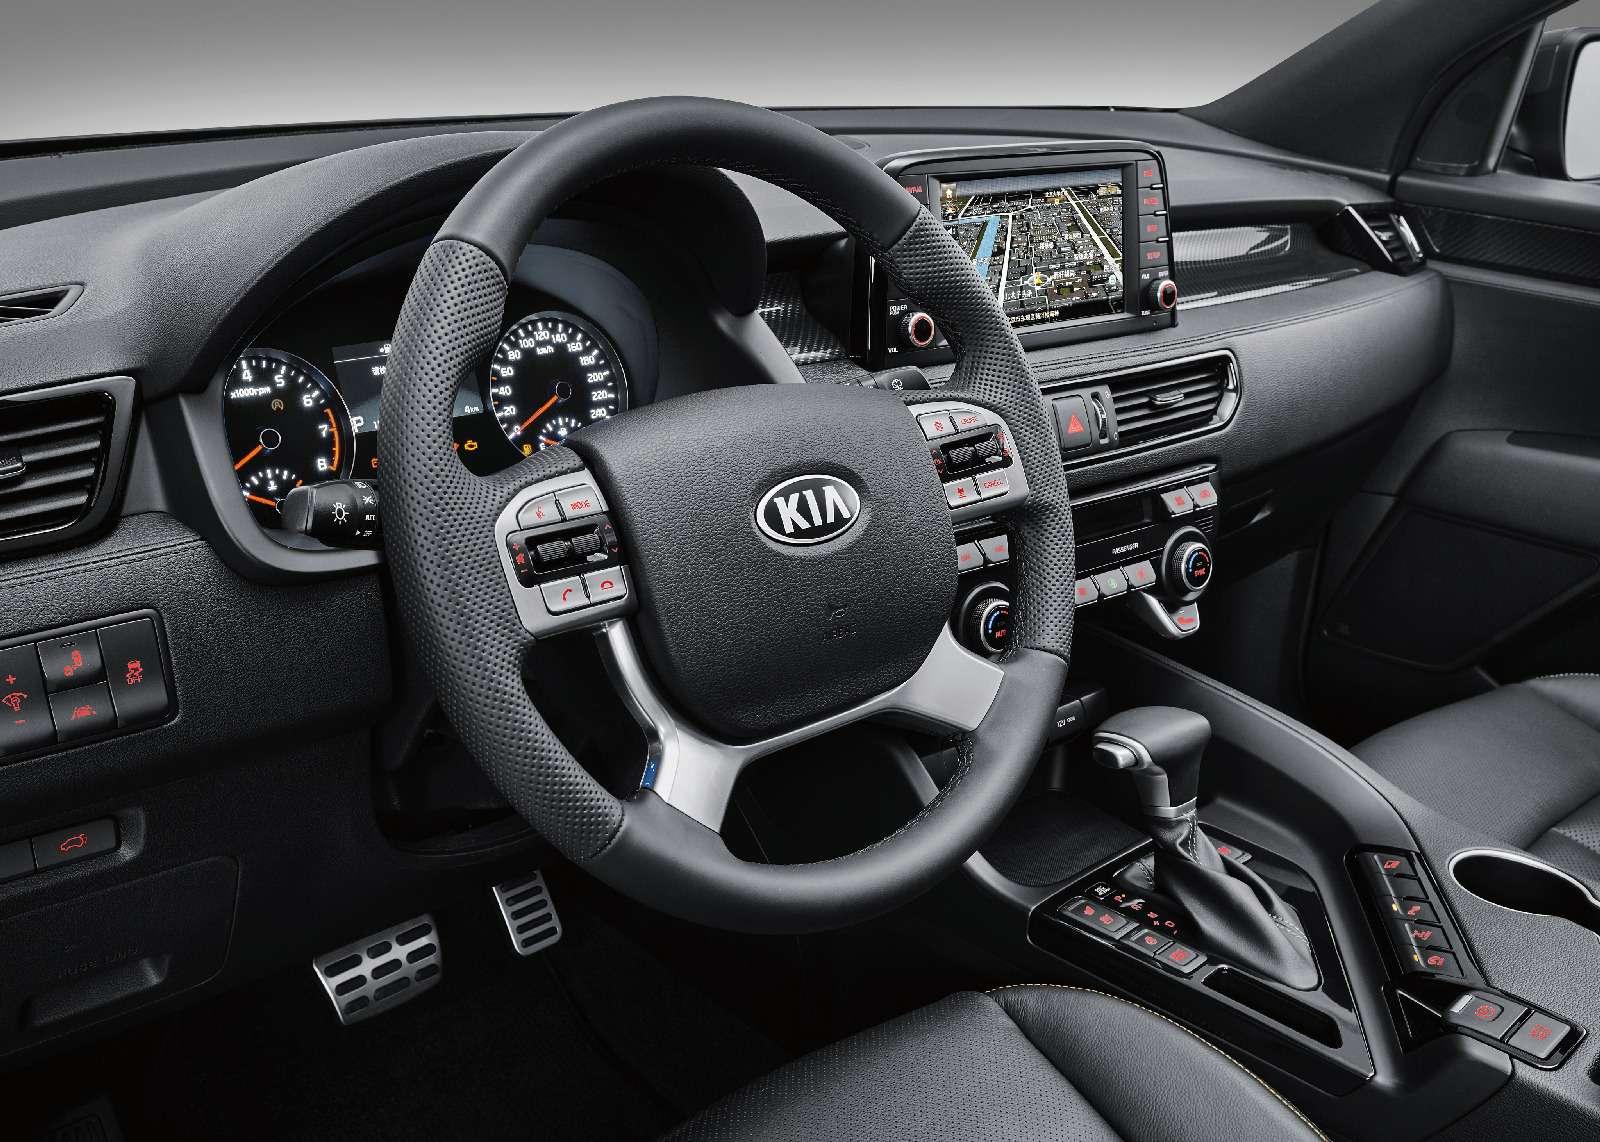 Дешево ипо-домашнему: стартовали продажи кроссовера Kia KX7— фото 724596